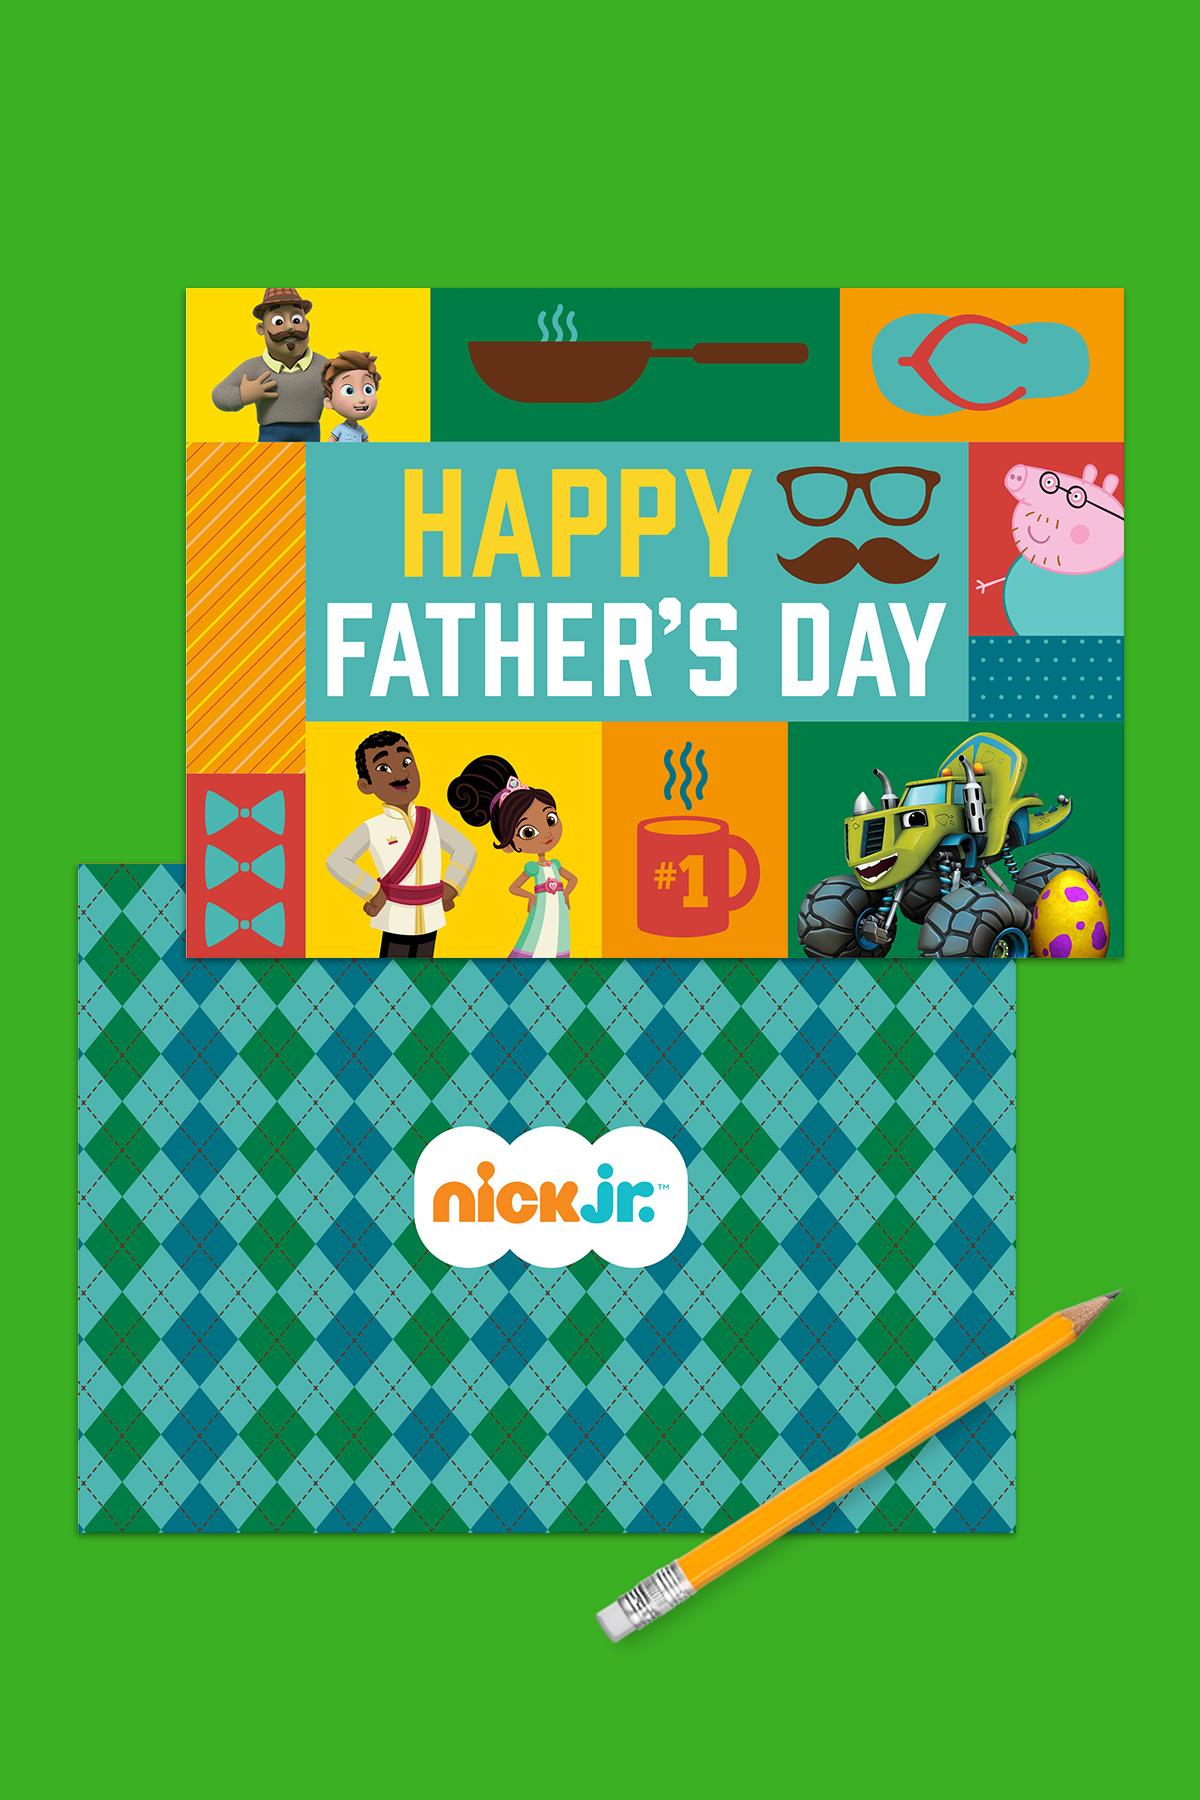 Nick Jr. Printable Father's Day Card